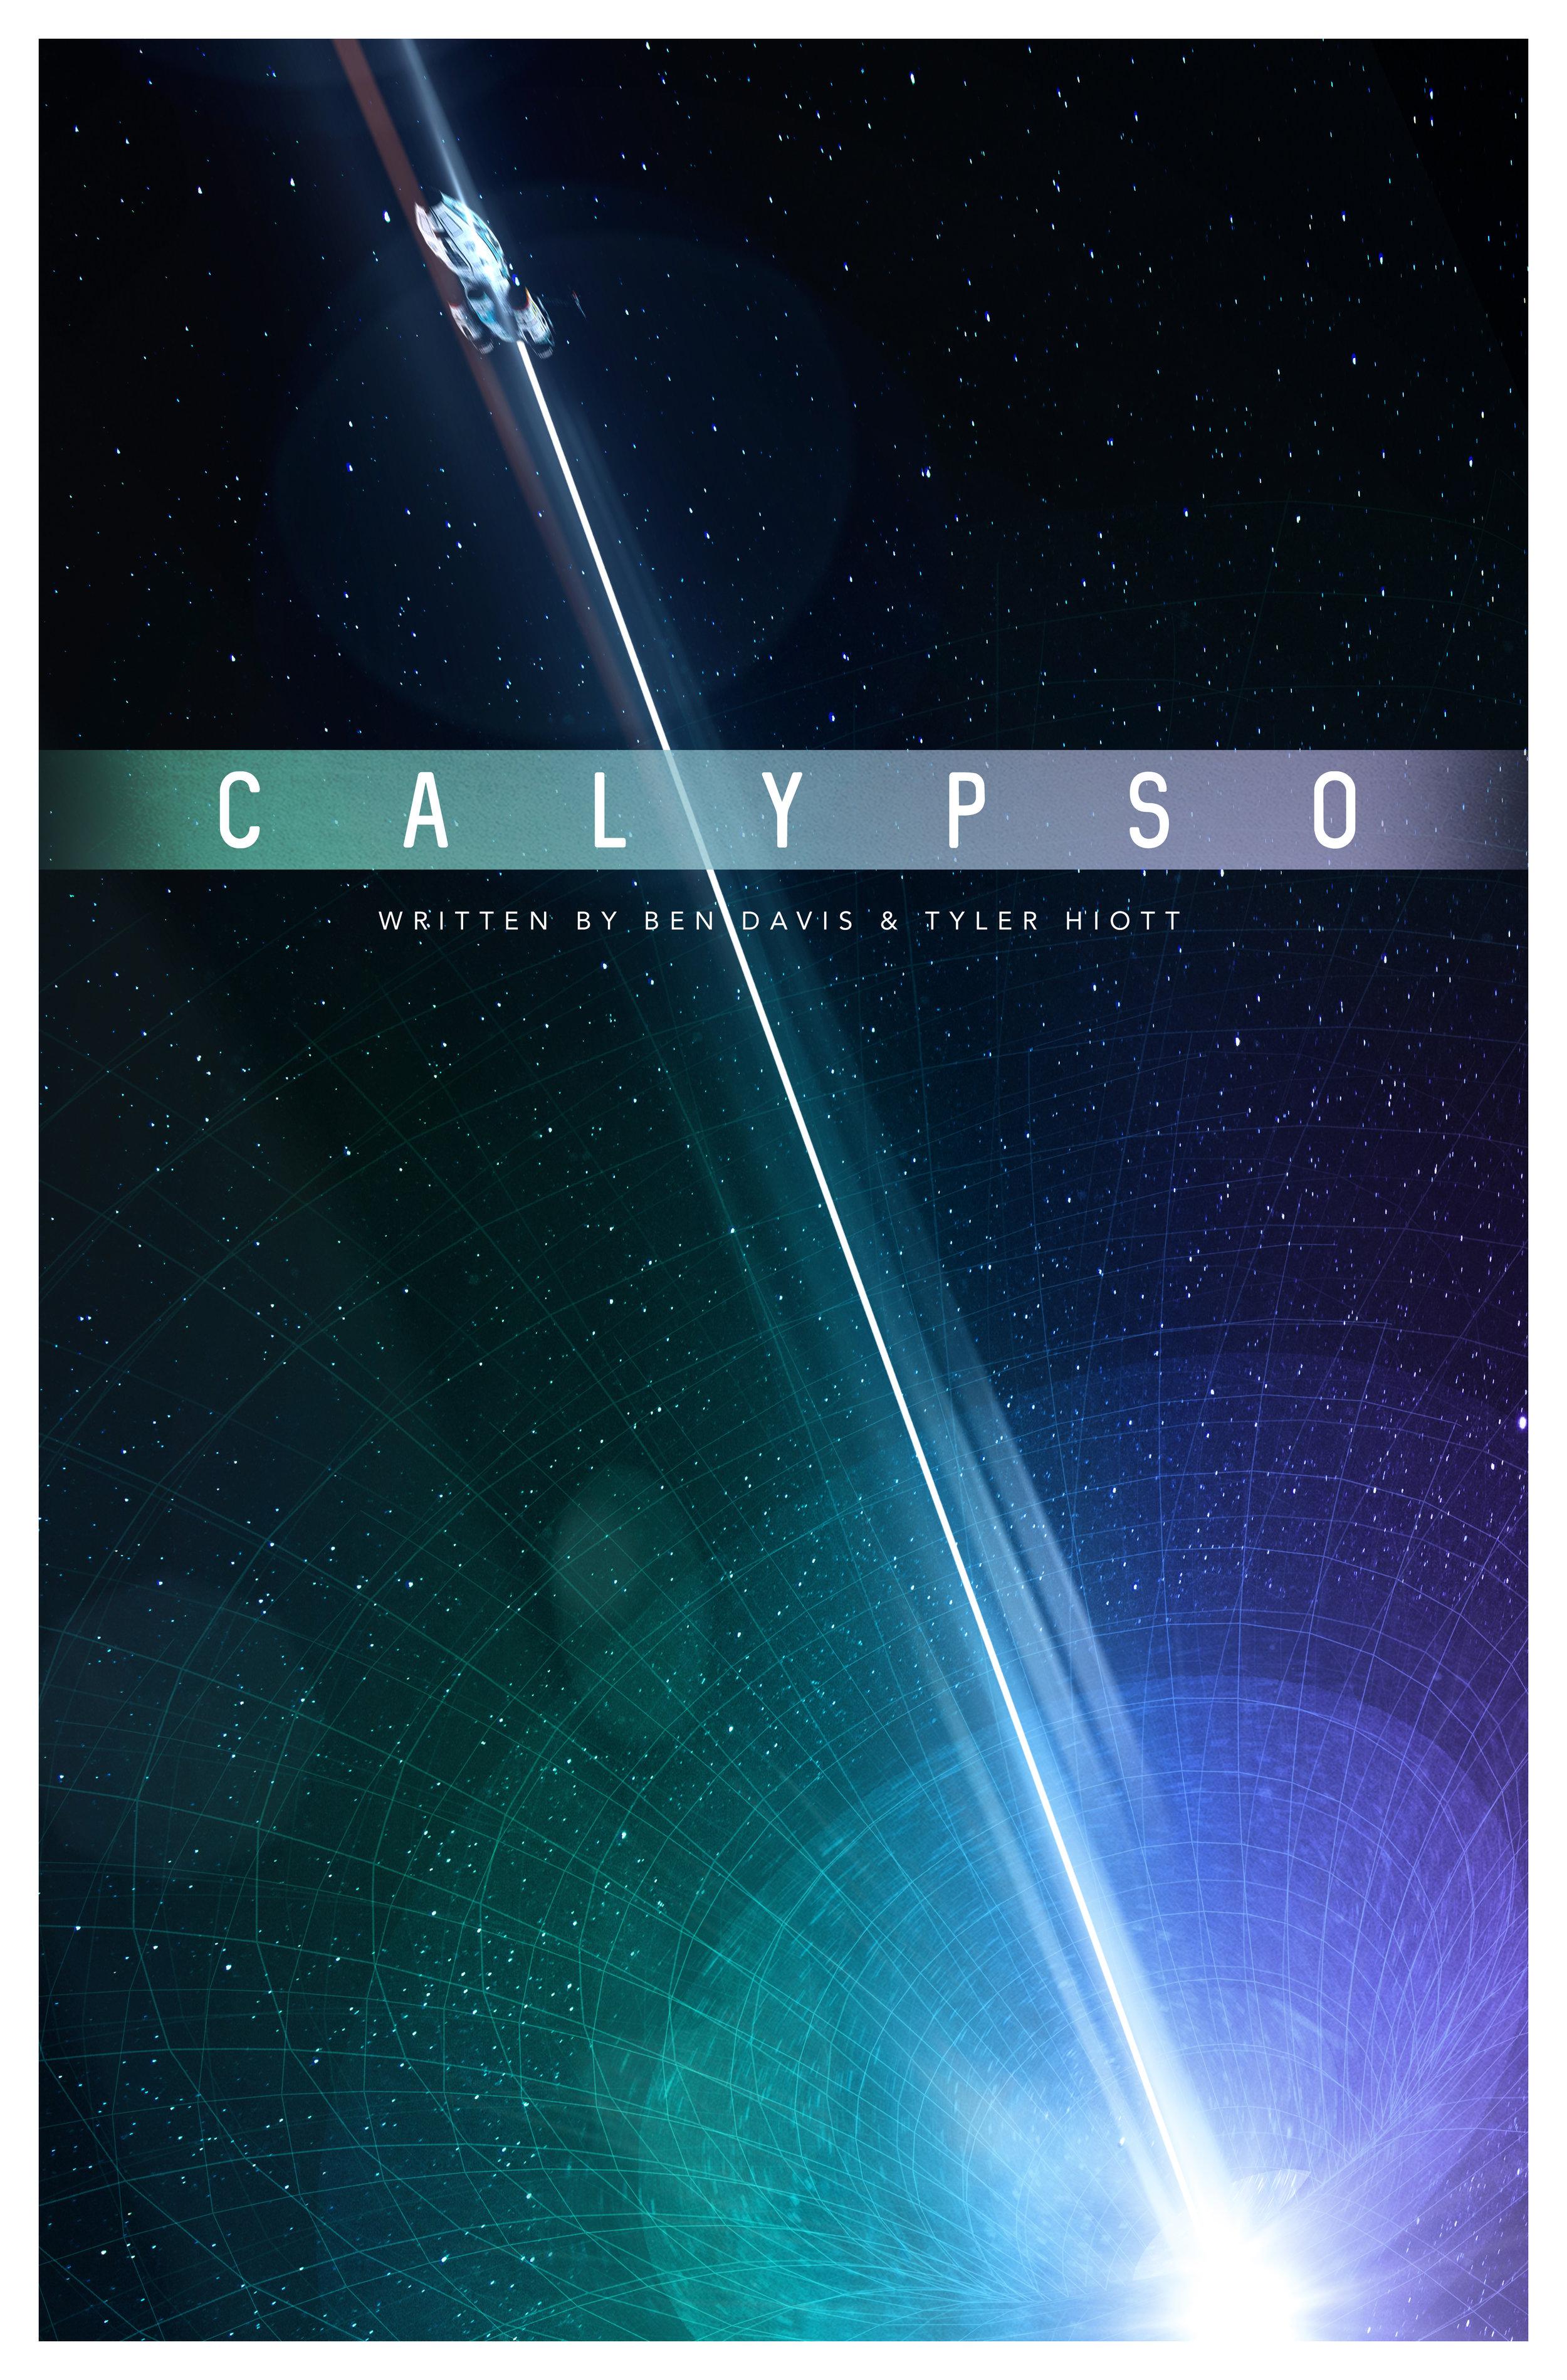 Calypso 9.25.jpg